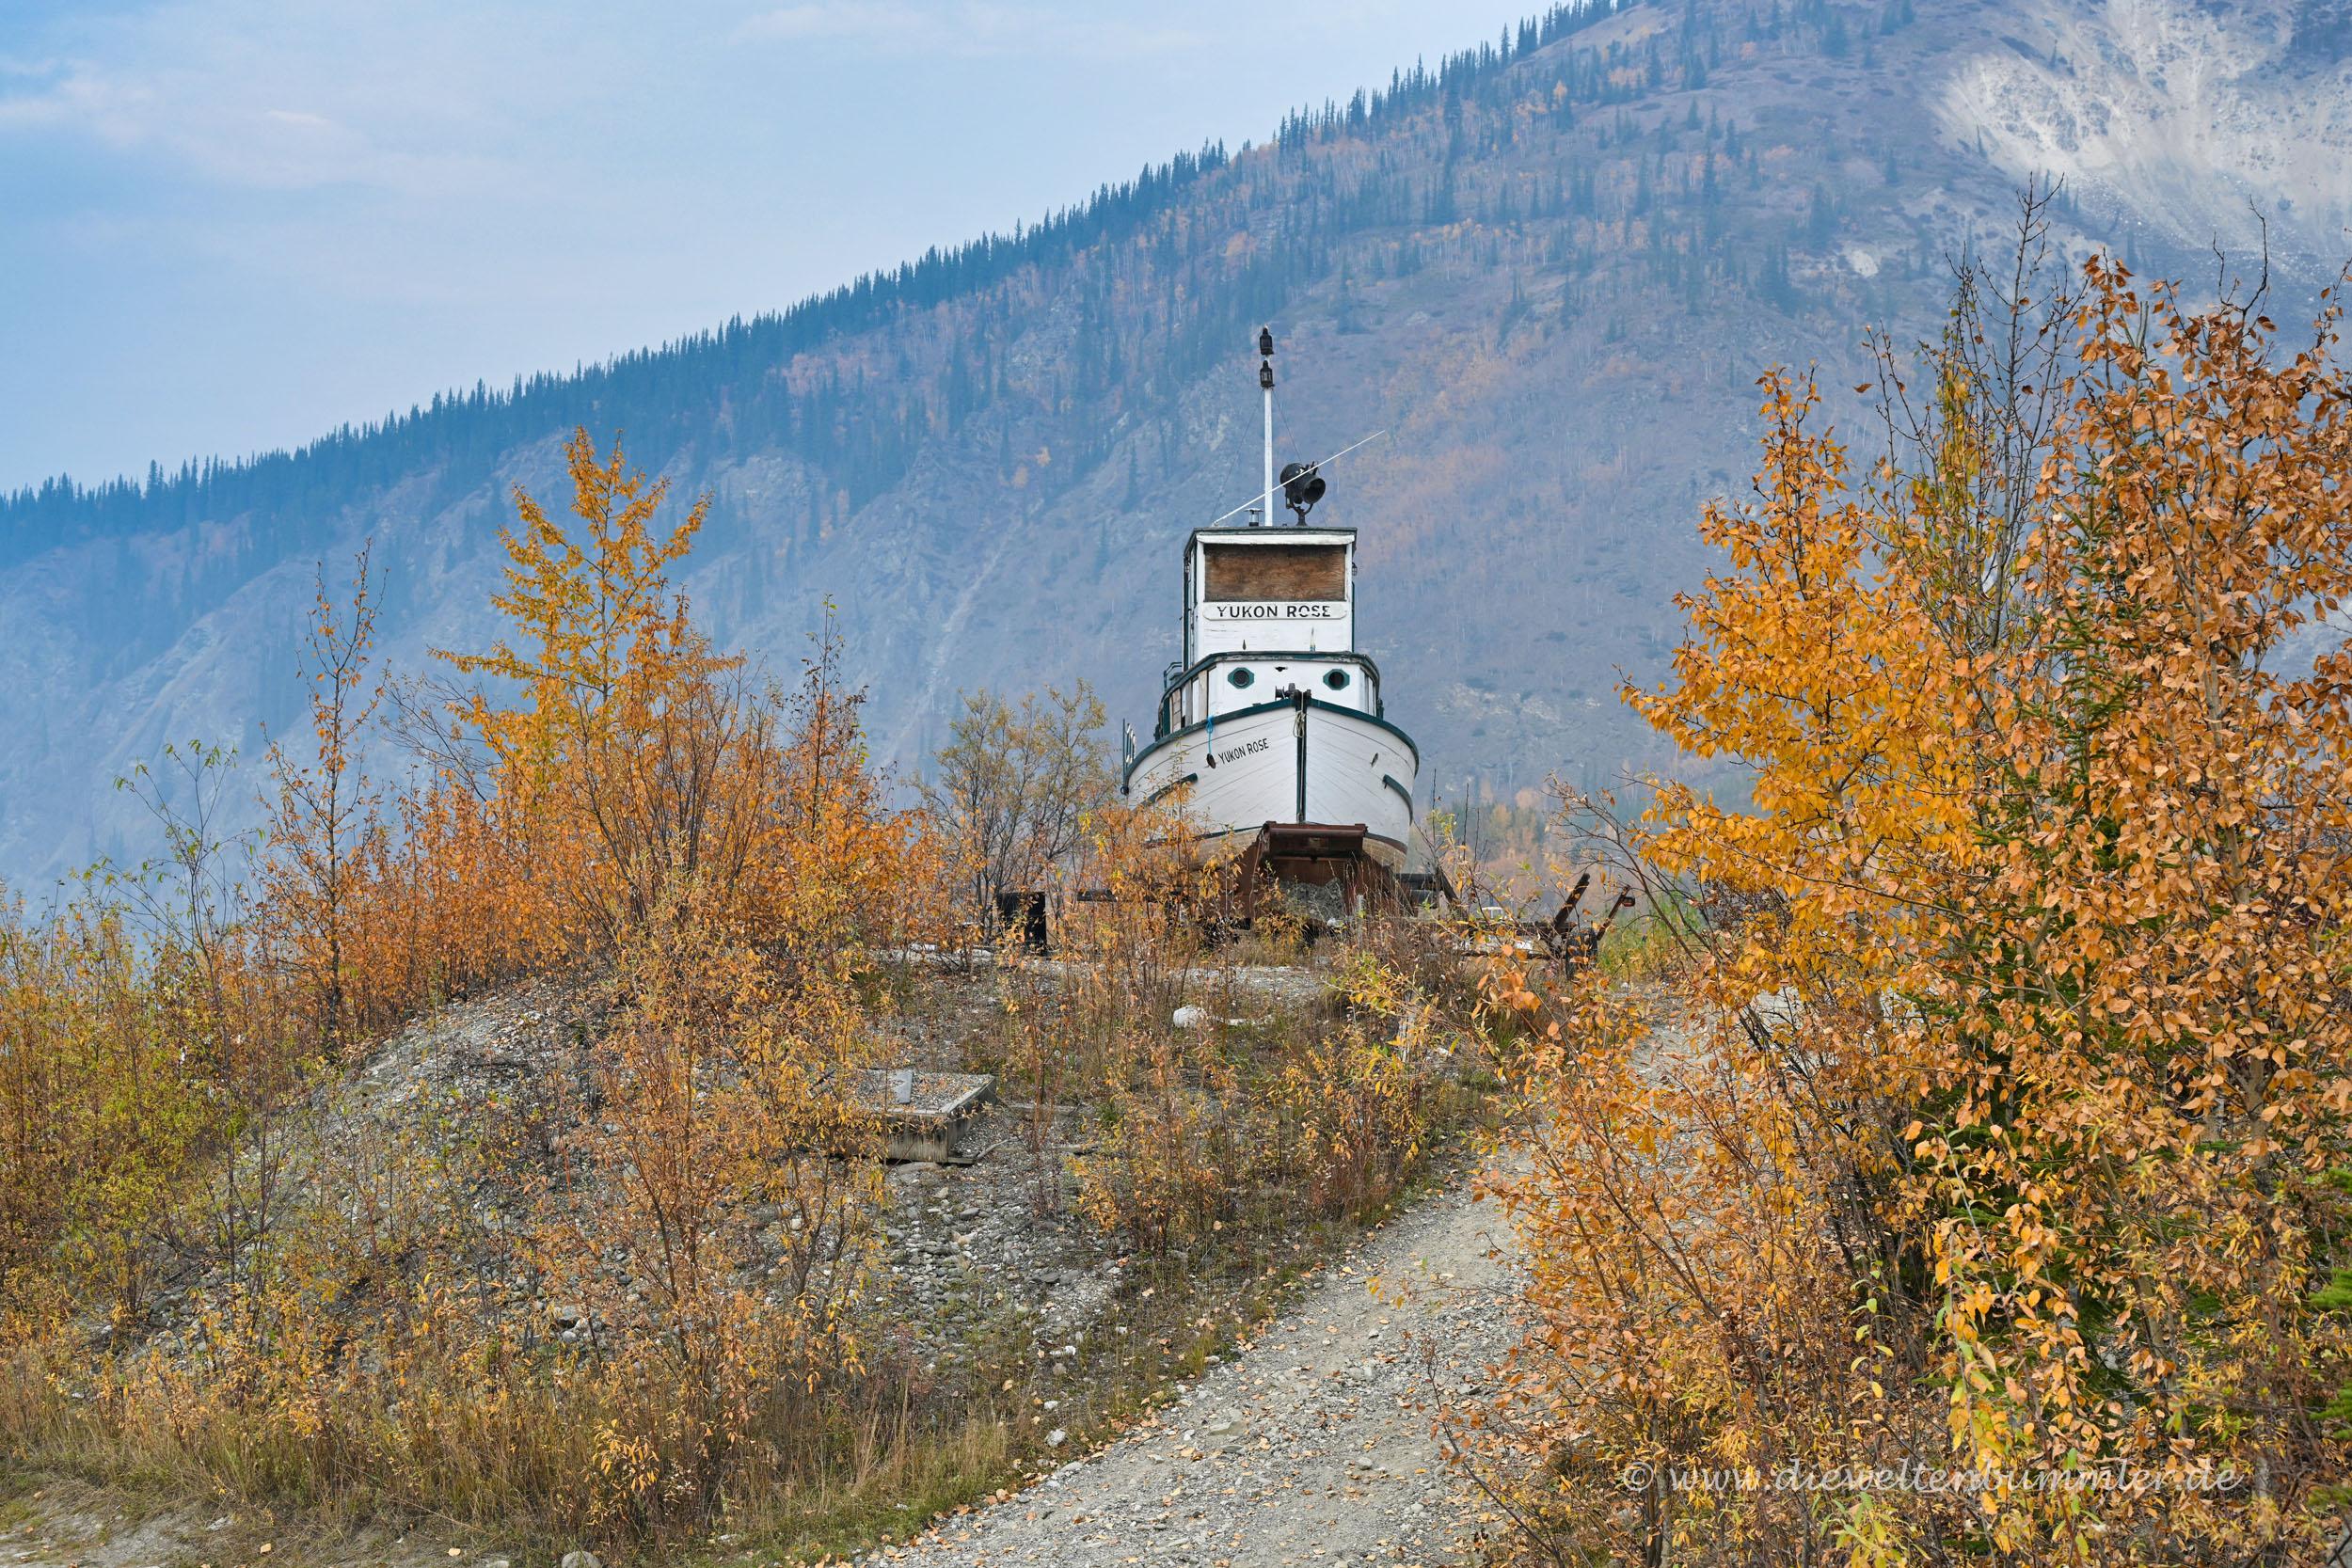 Das alte Schiff Yukon Rose